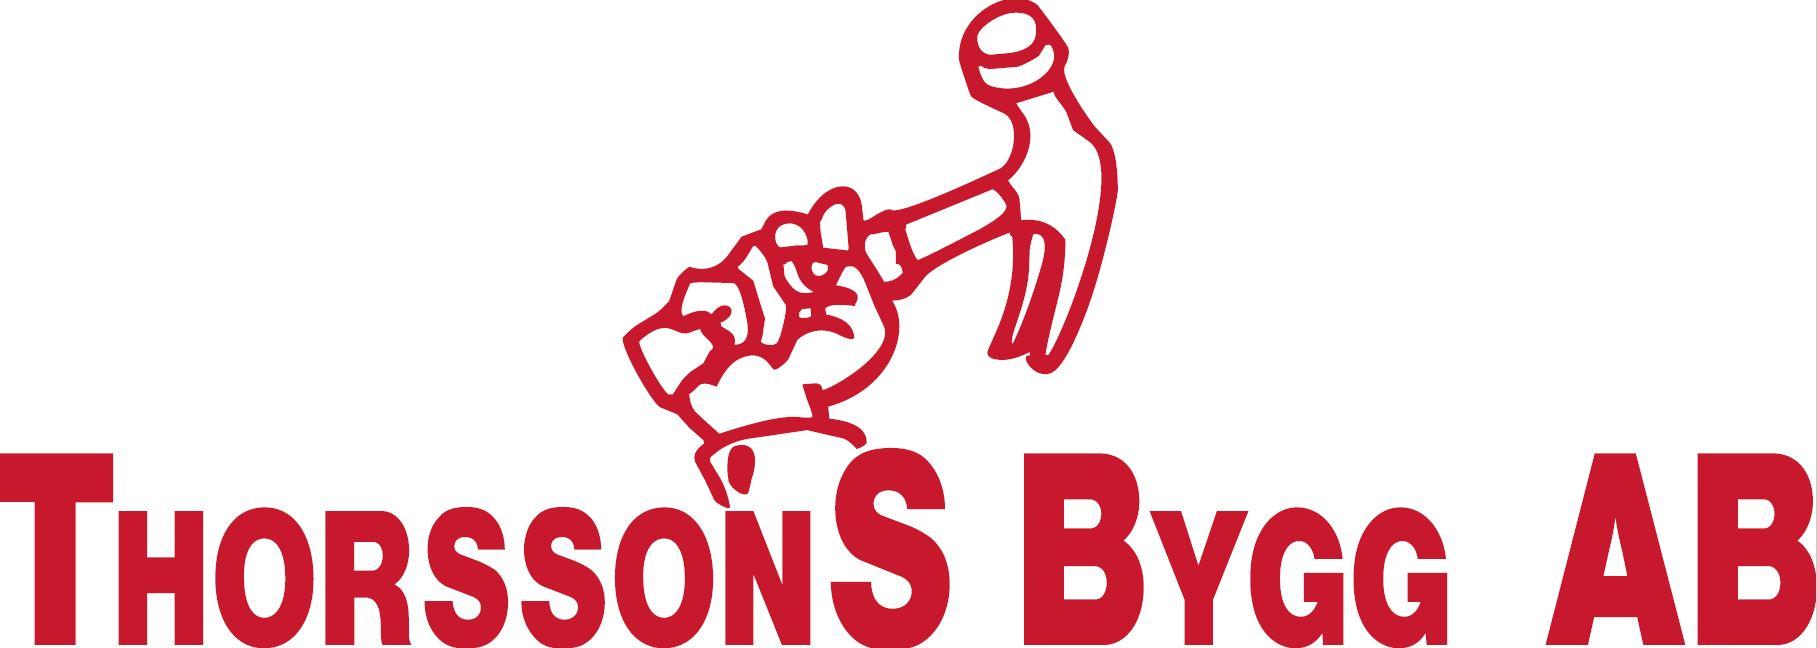 Thorssons Bygg AB